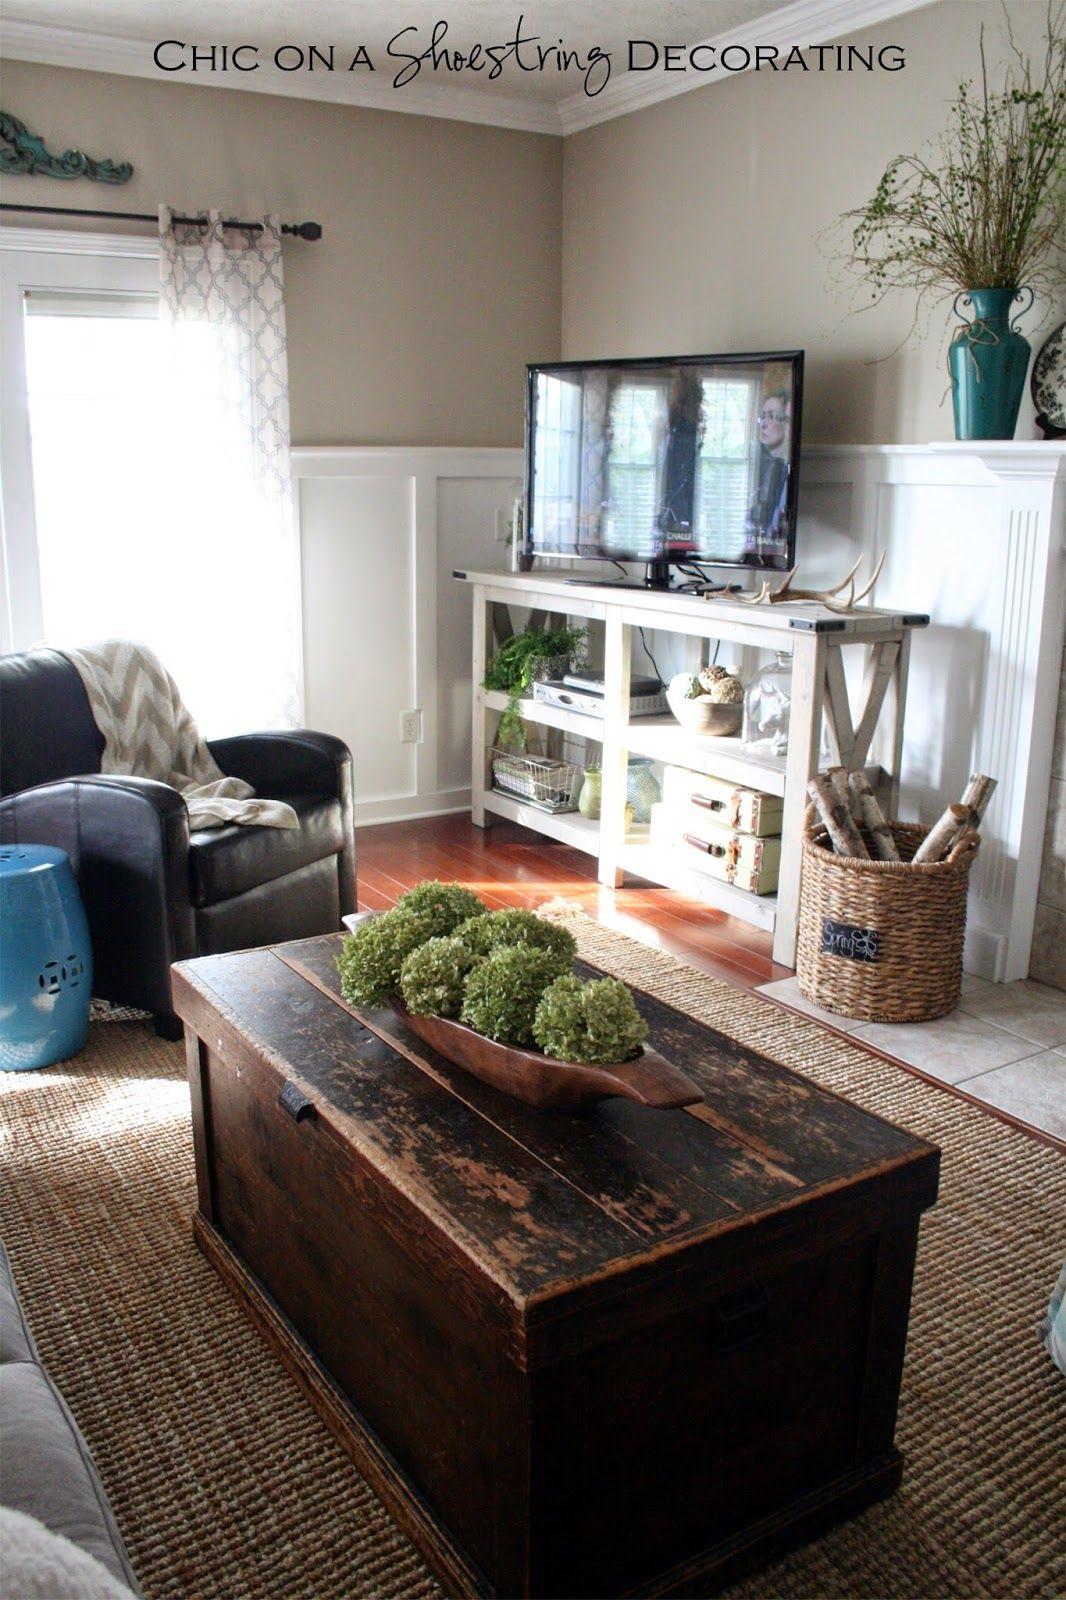 My Farmhouse Chic Living Room Reveal | Home | Pinterest | Deko ideen ...